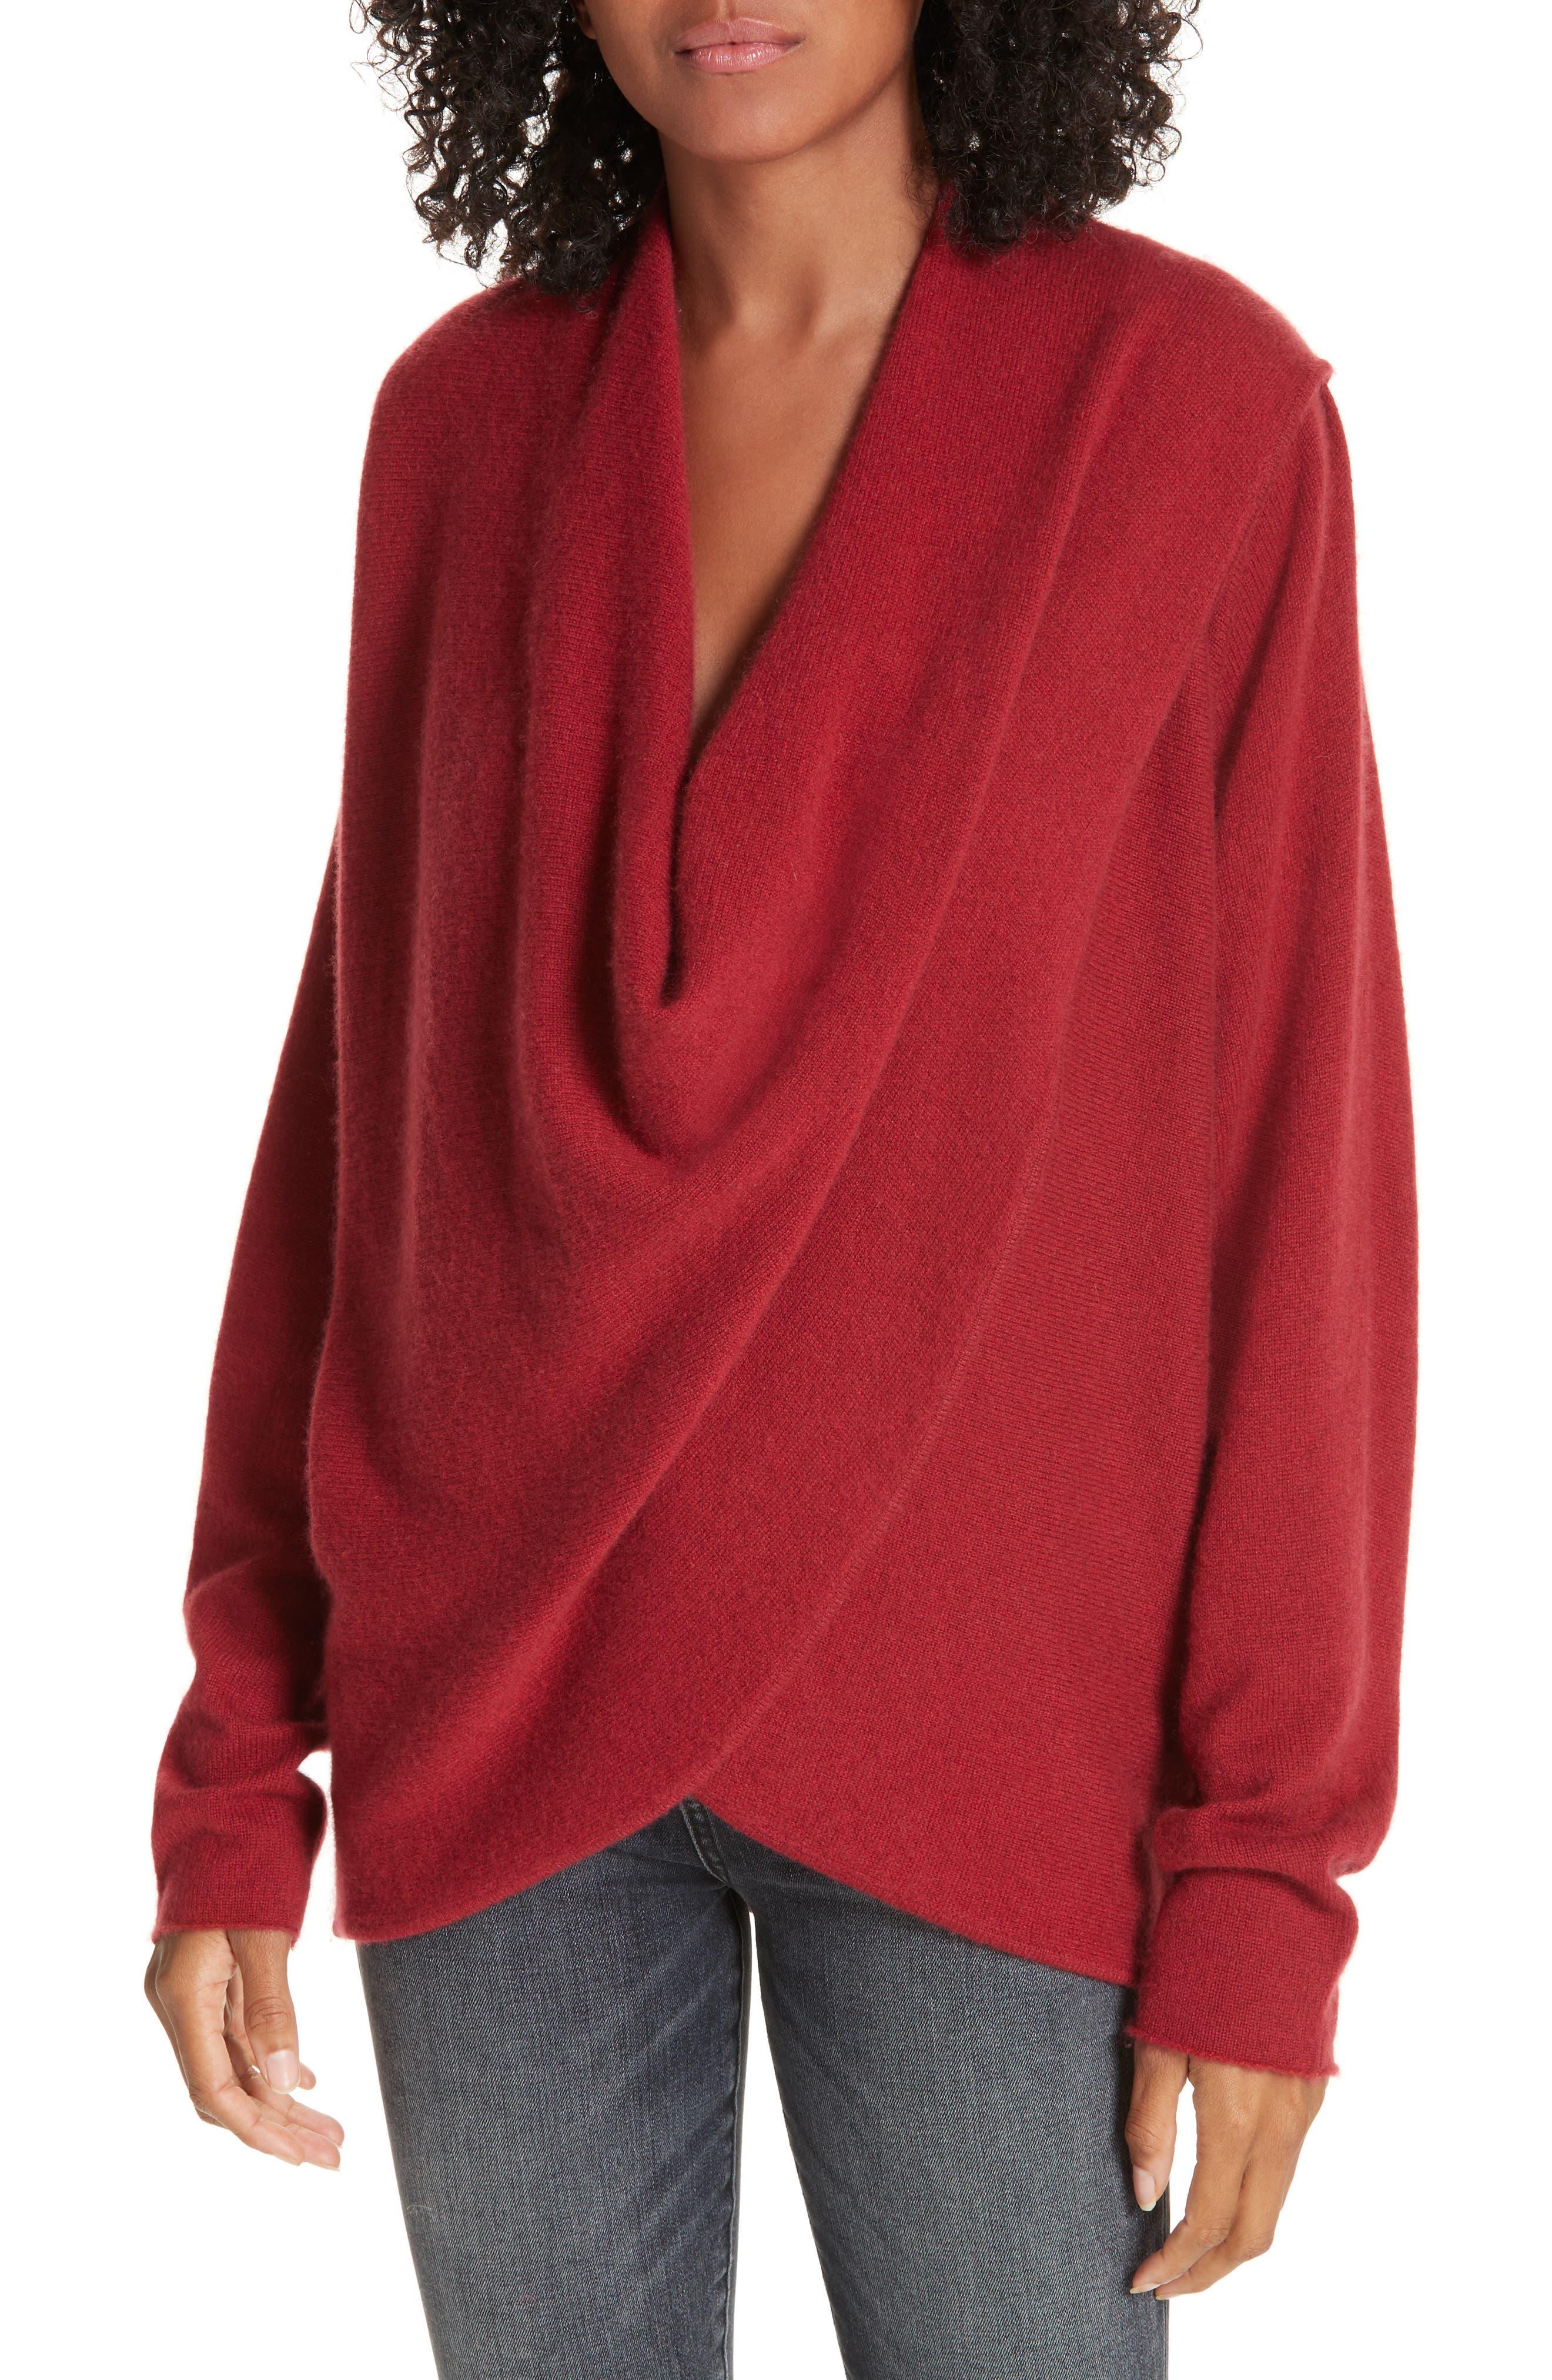 BROCHU WALKER Clea Cashmere Wrap Sweater, Main, color, TANGIER